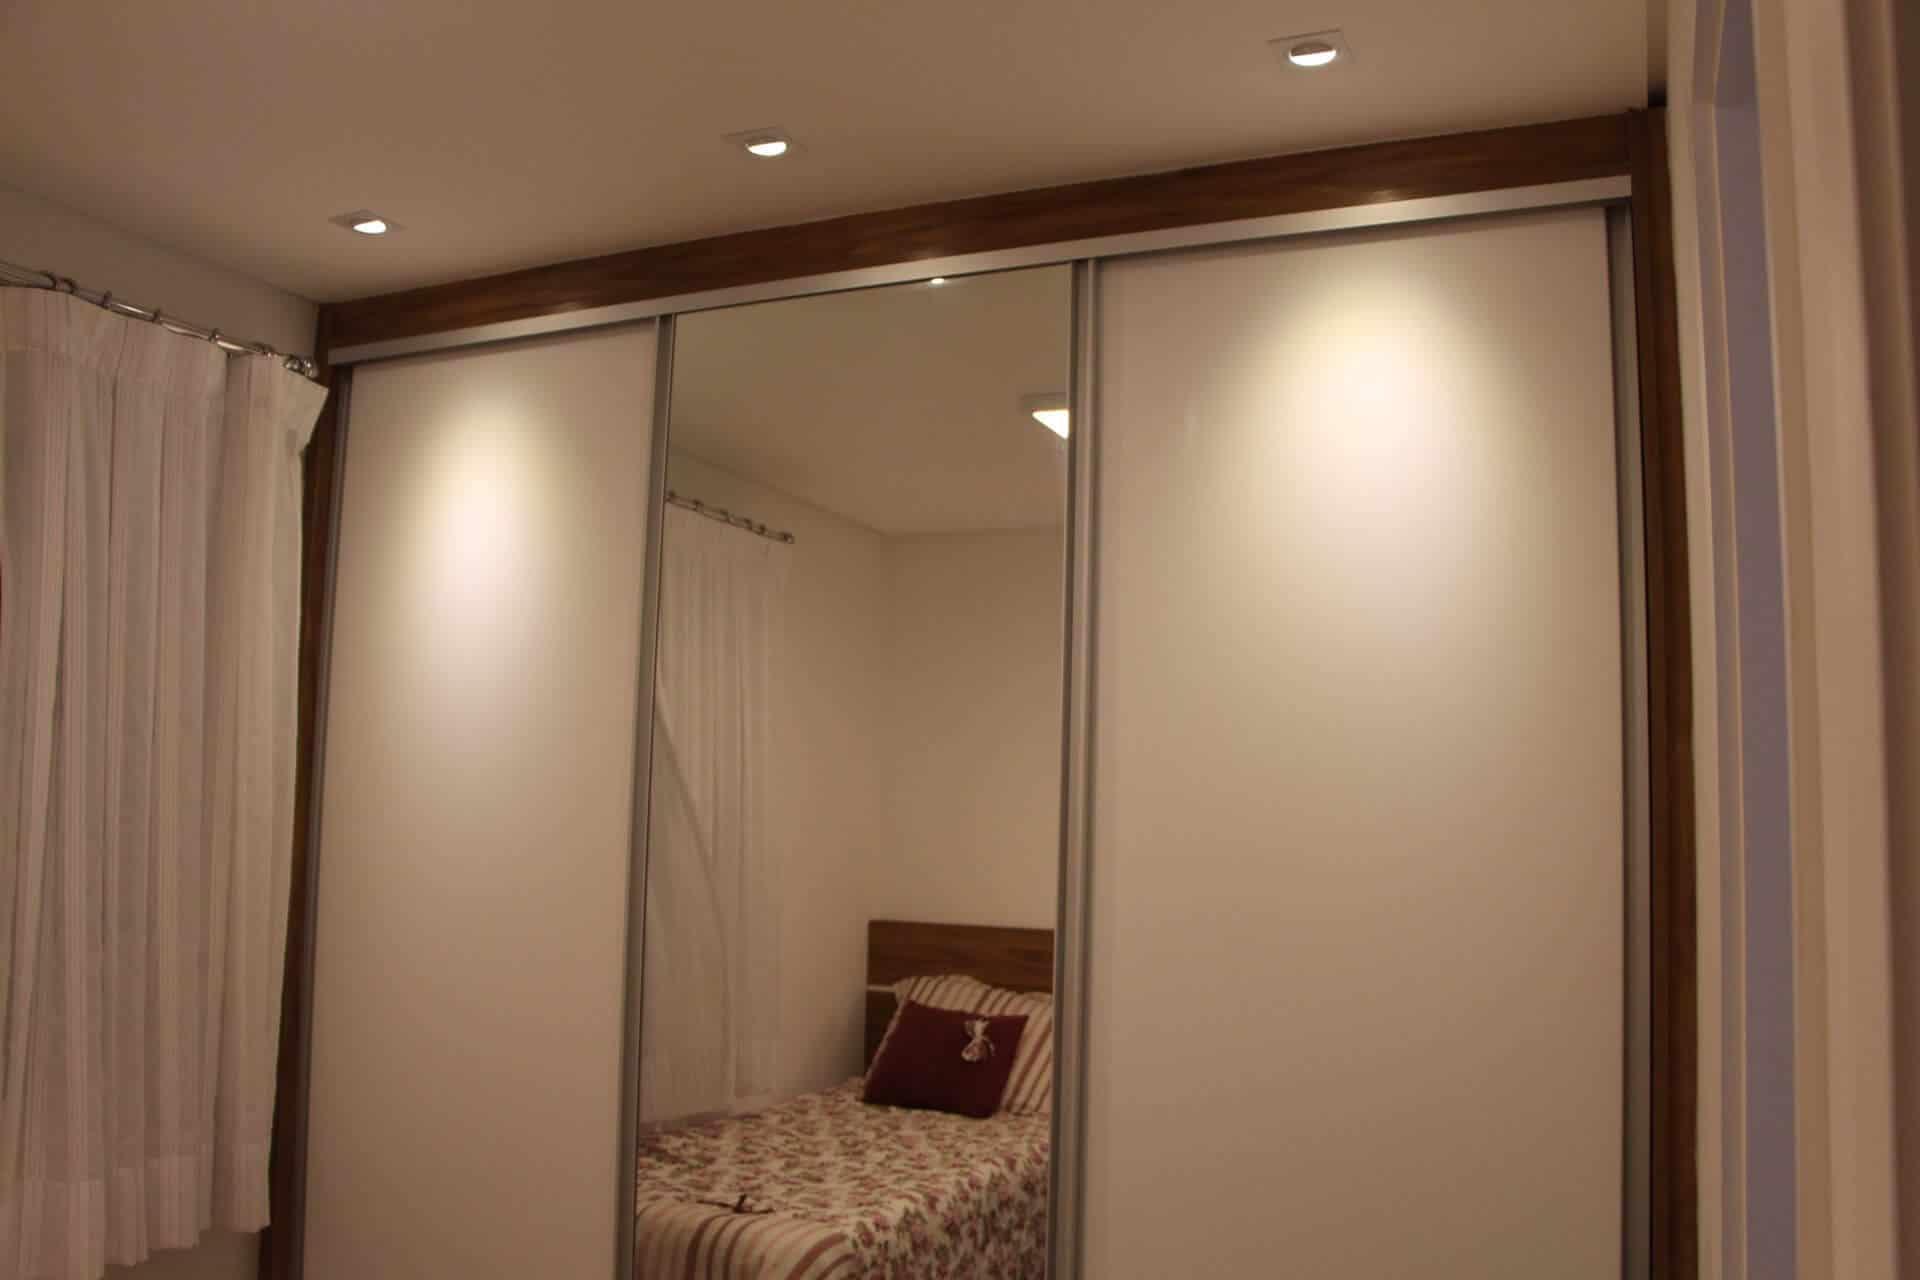 dormitorio-planejado_moveis-sob-medida-galeria-114